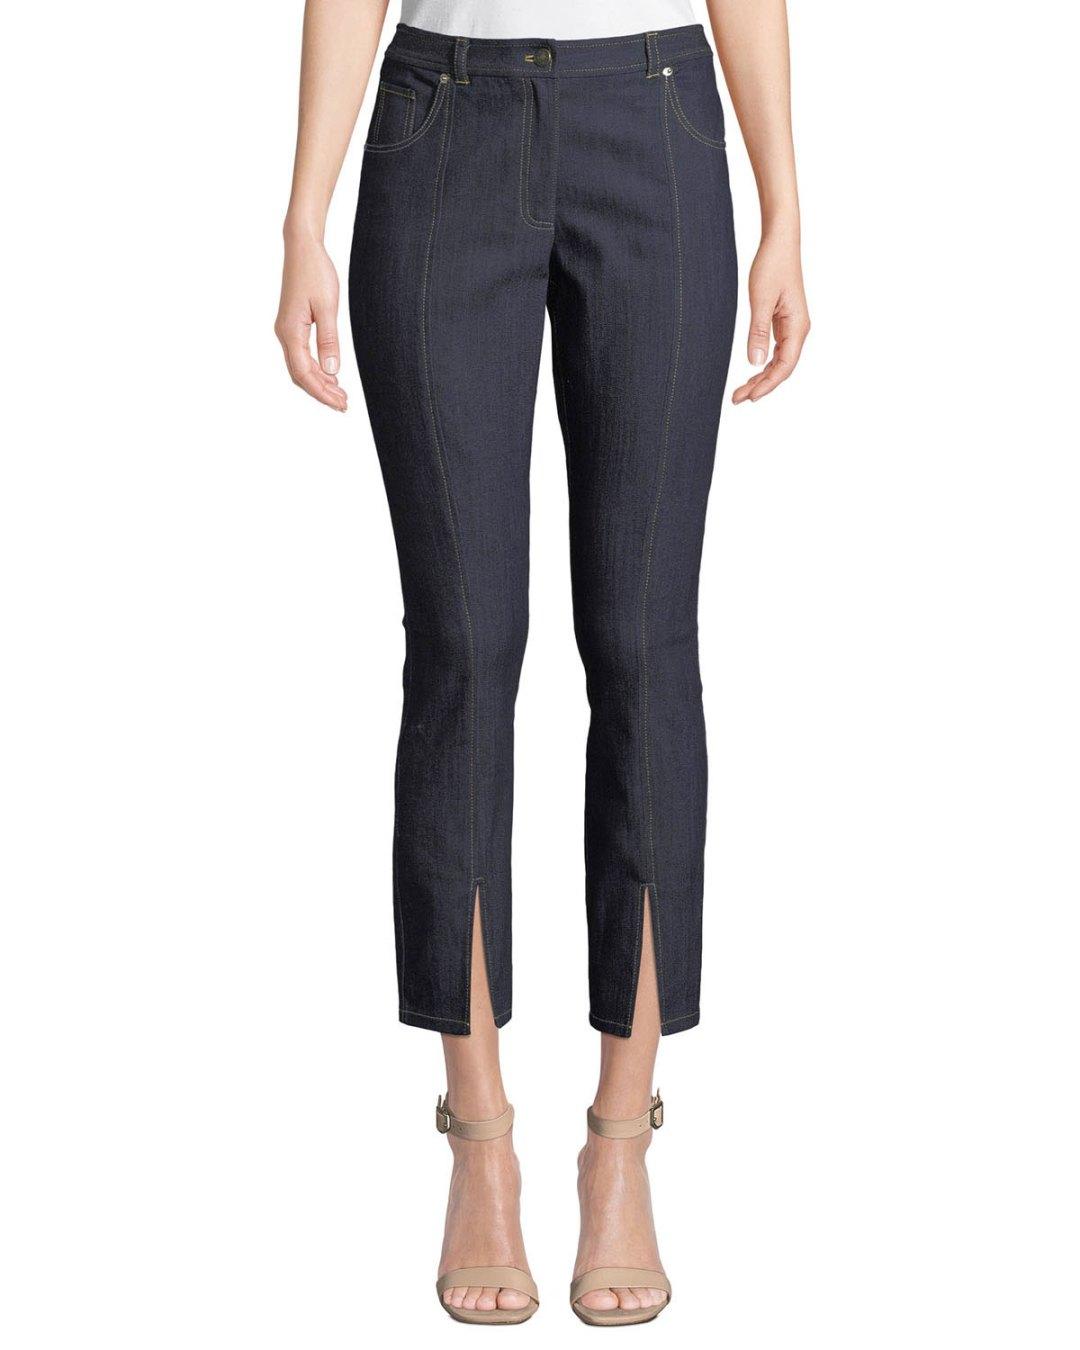 d958054cfe4 ...  295.00 – Neiman Marcus – Rosa Mid-Rise Split Straight-Leg Pants –   295.00